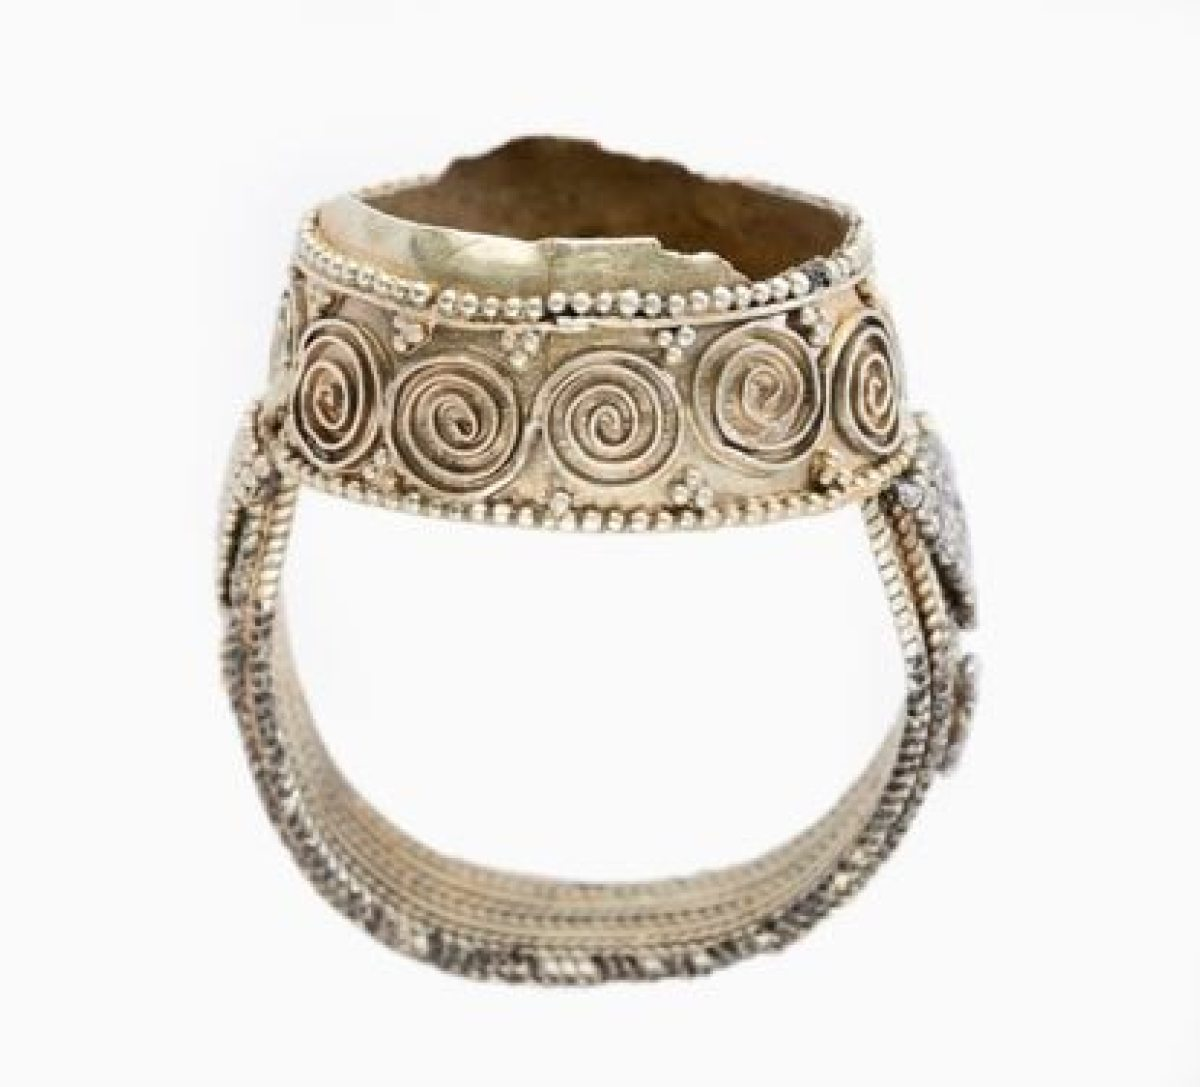 Un anillo de plata del siglo XI del tesoro de Amarguilla.